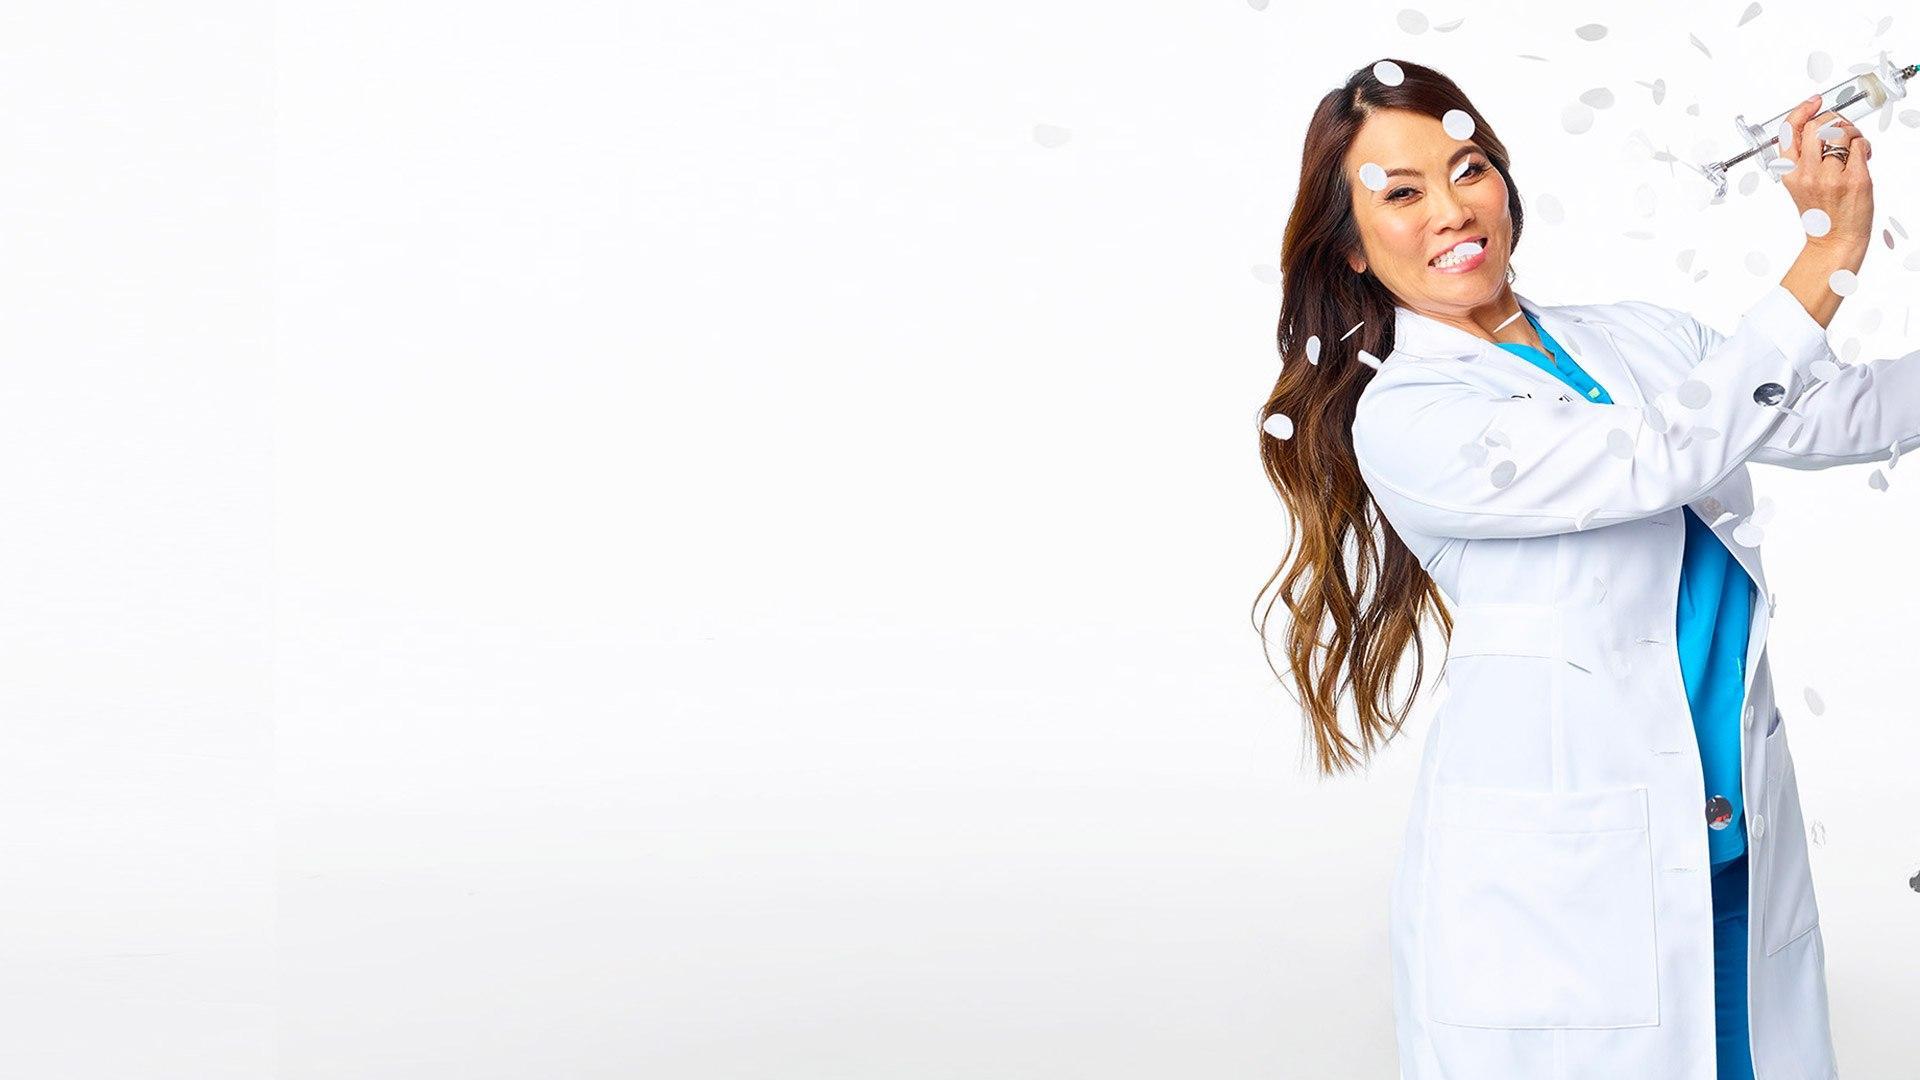 Real Time Dr. Pimple Popper: dr.ssa schiacciabrufoli - Prima visita